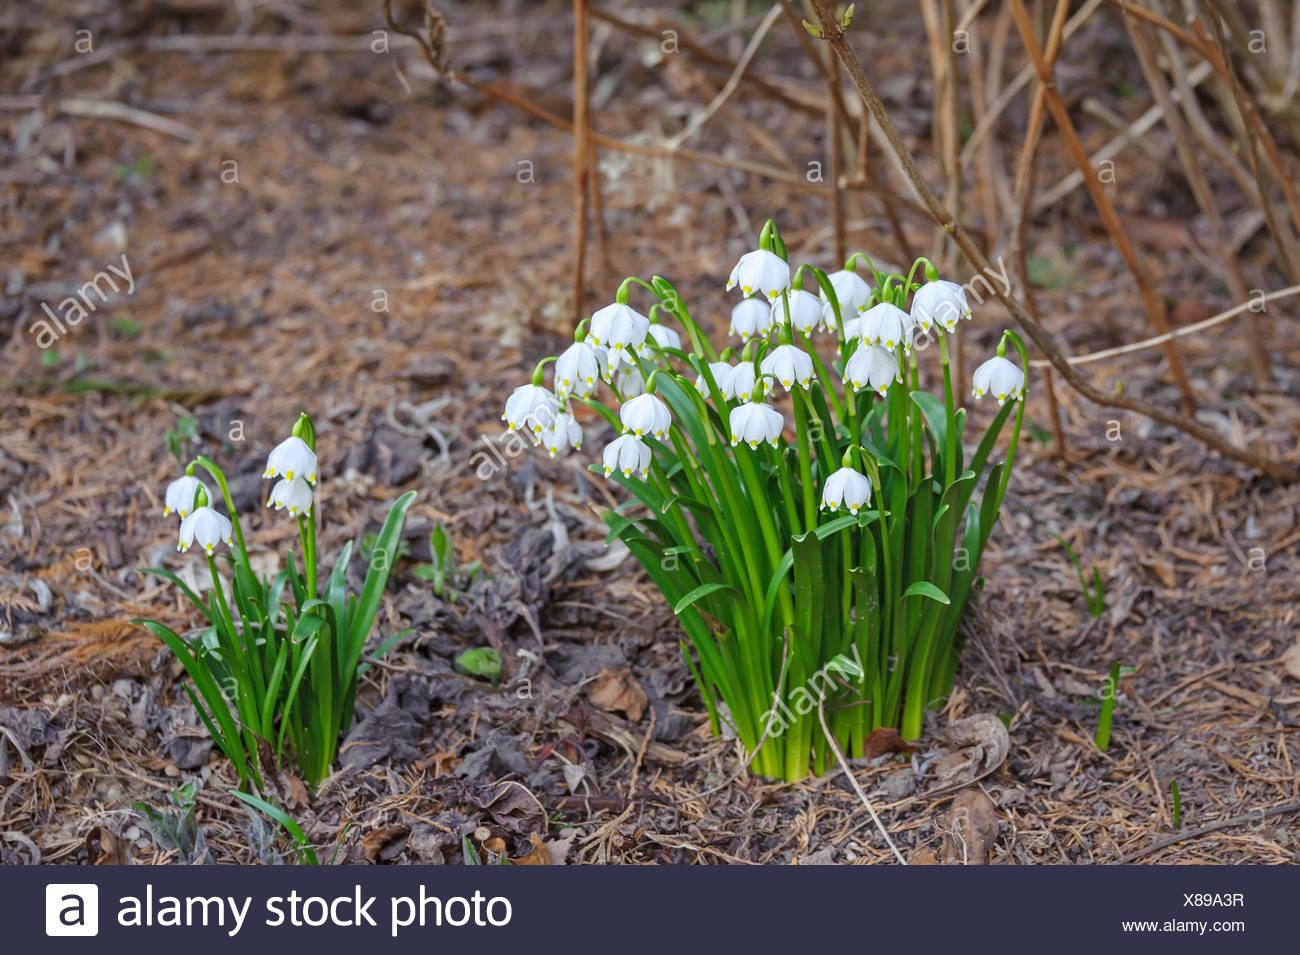 spring snowflake (Leucojum vernum), blooming, Germany, Saxony - Stock Image